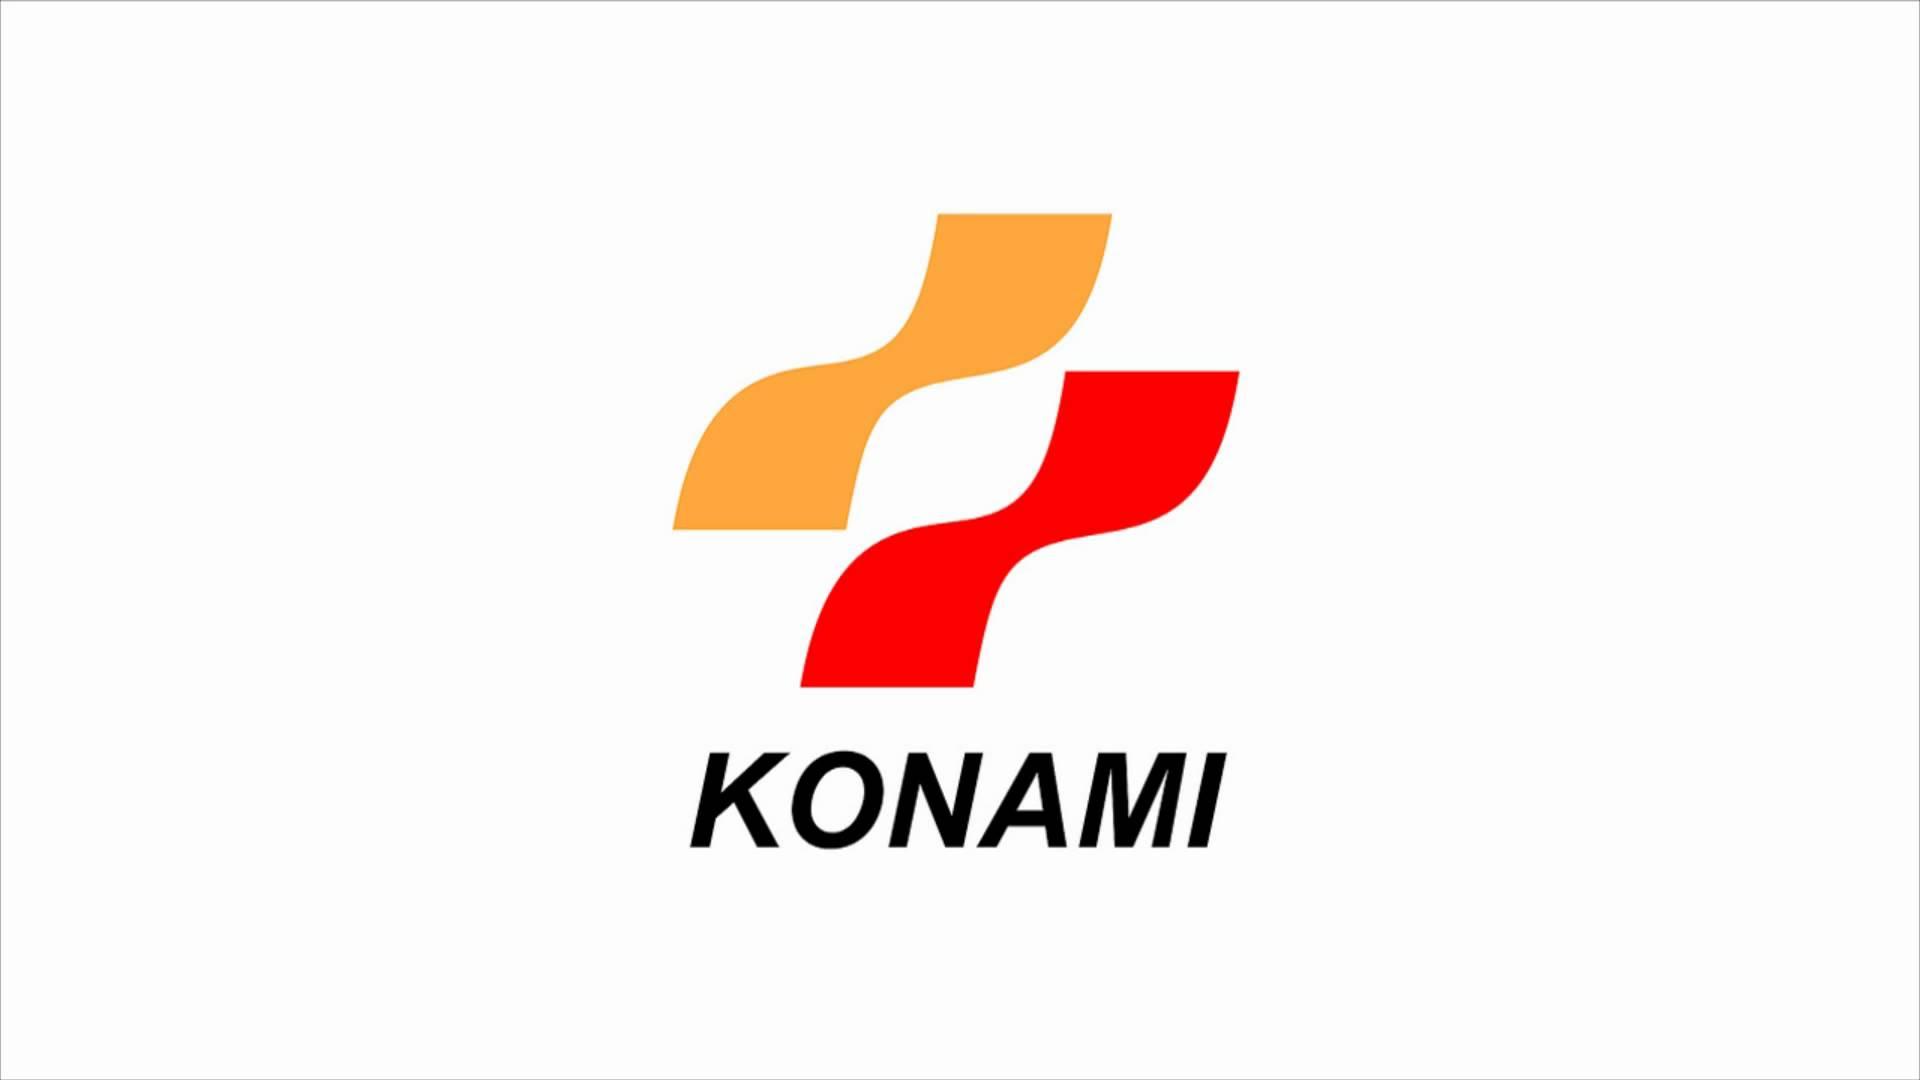 Konami Reveal TGS 16 Lineup